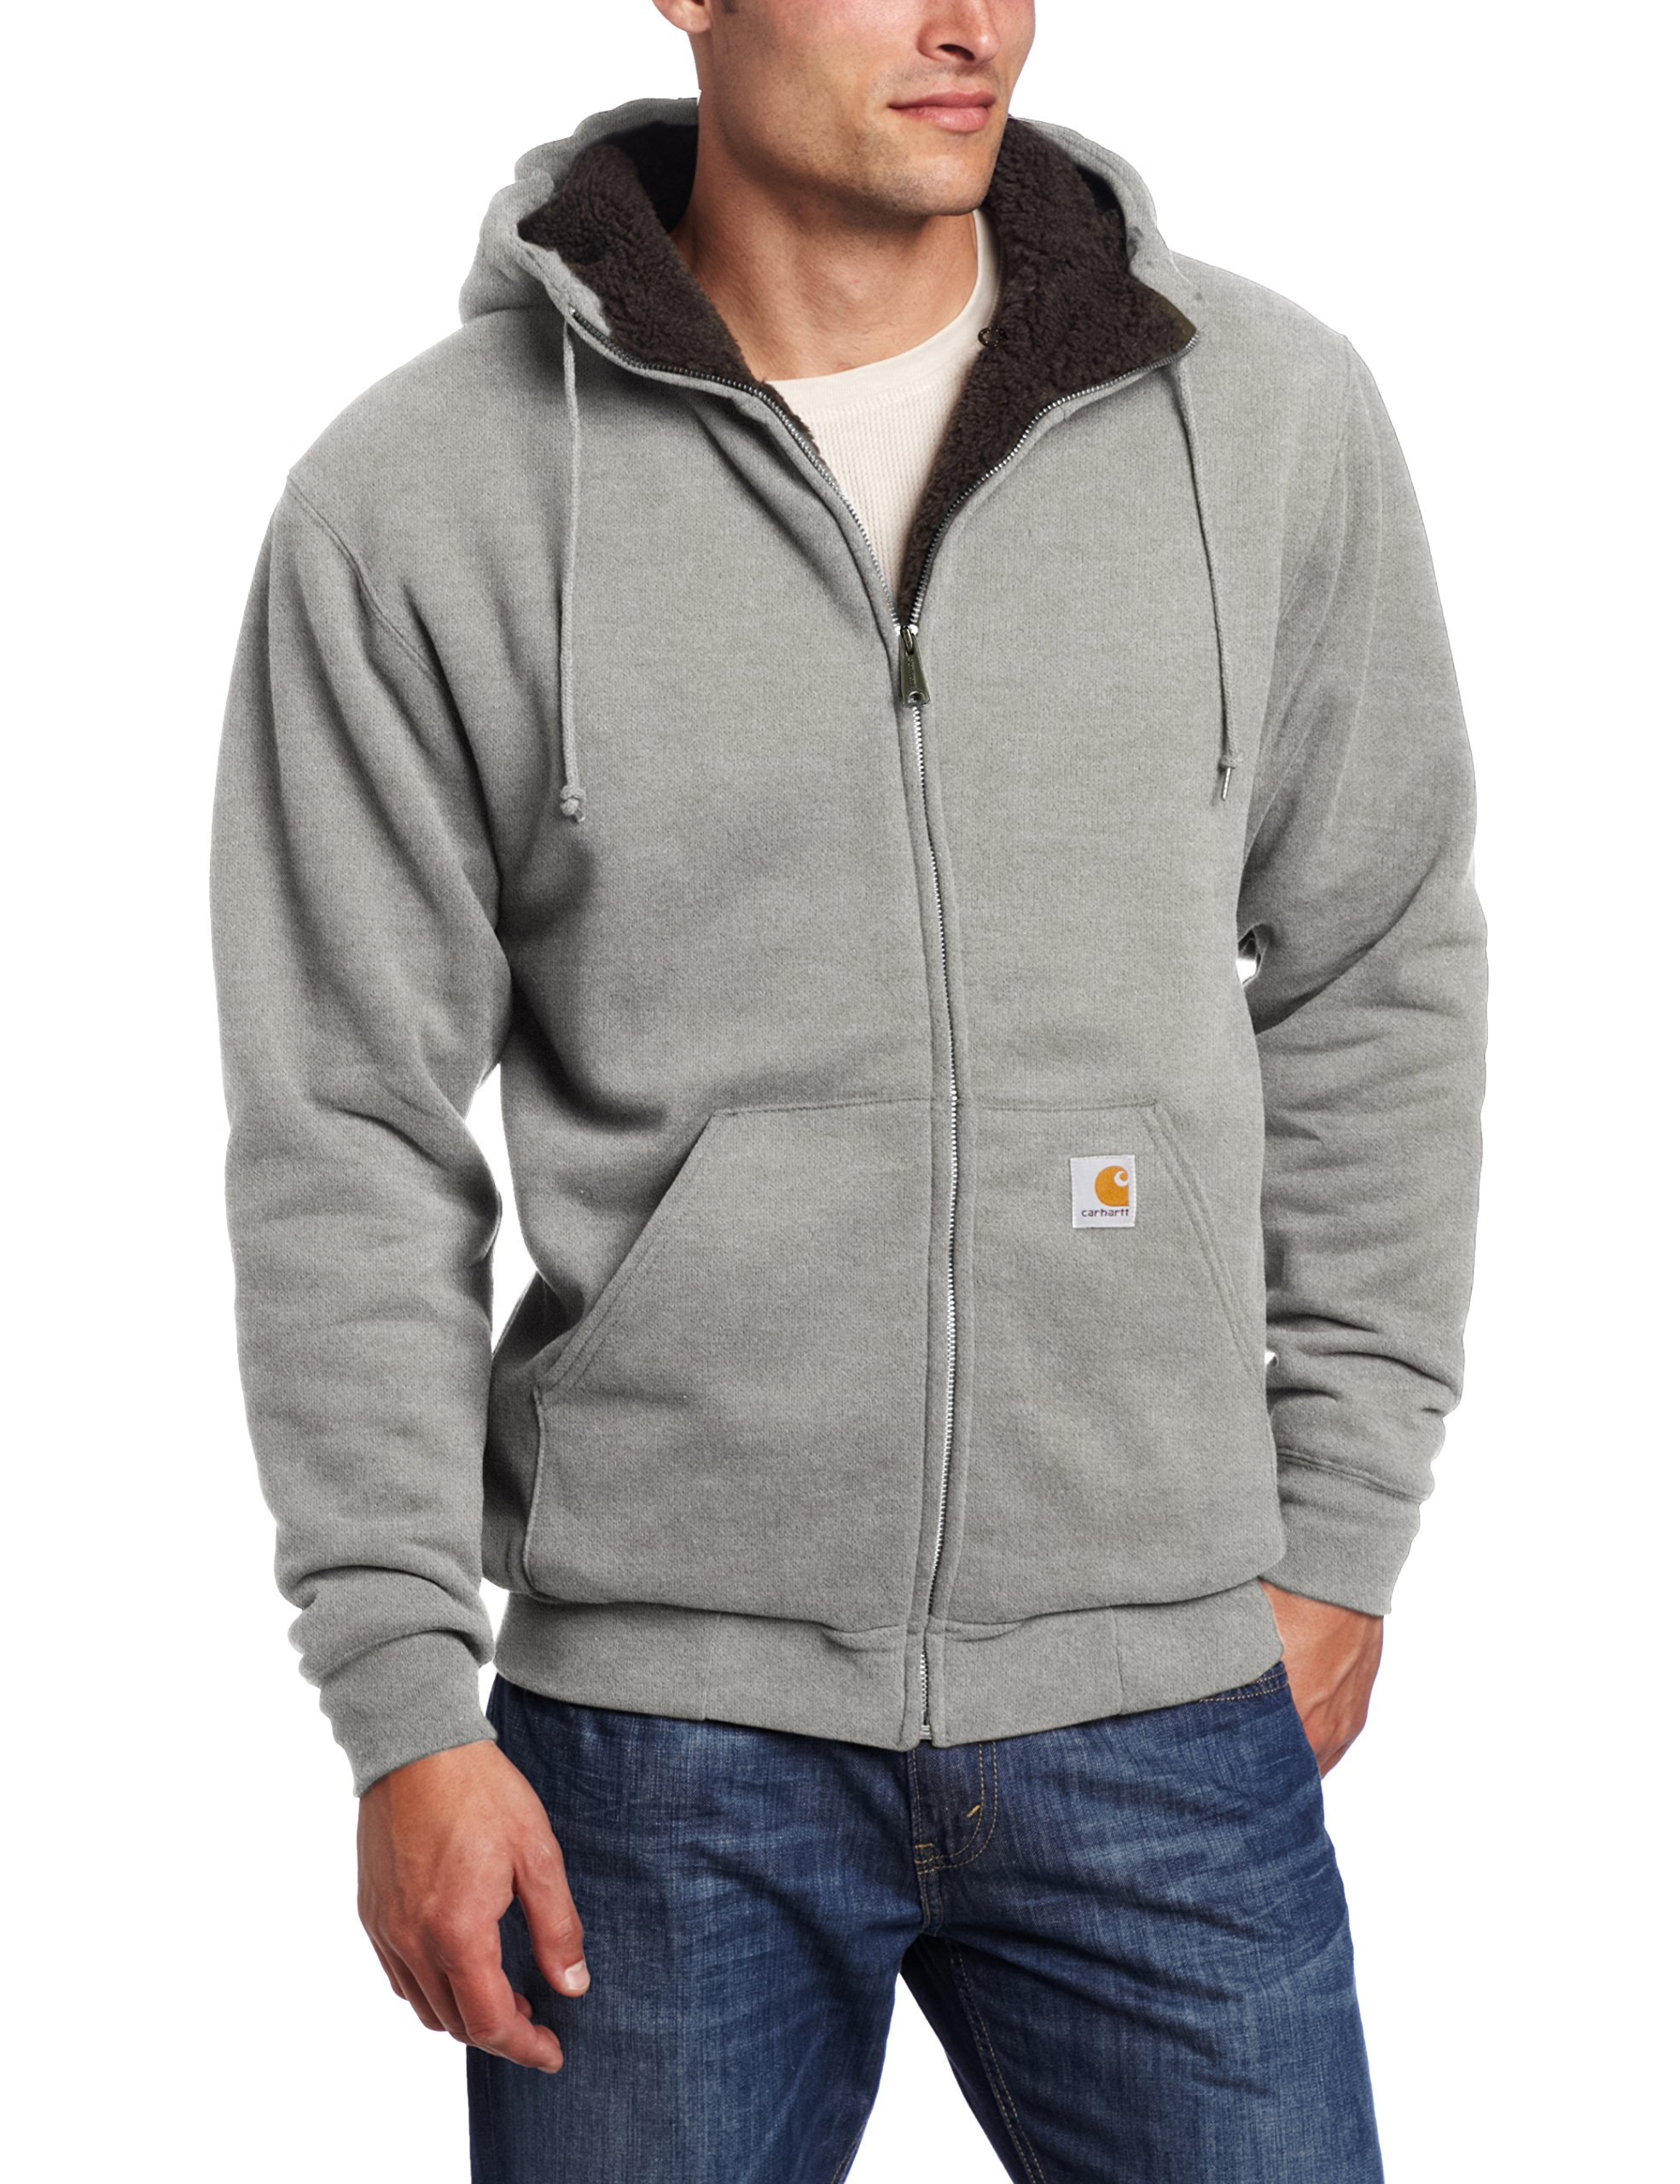 Carhartt Men's Collinston Brushed Fleece Sherpa Lined Sweatshirt,Slate Heather,Medium